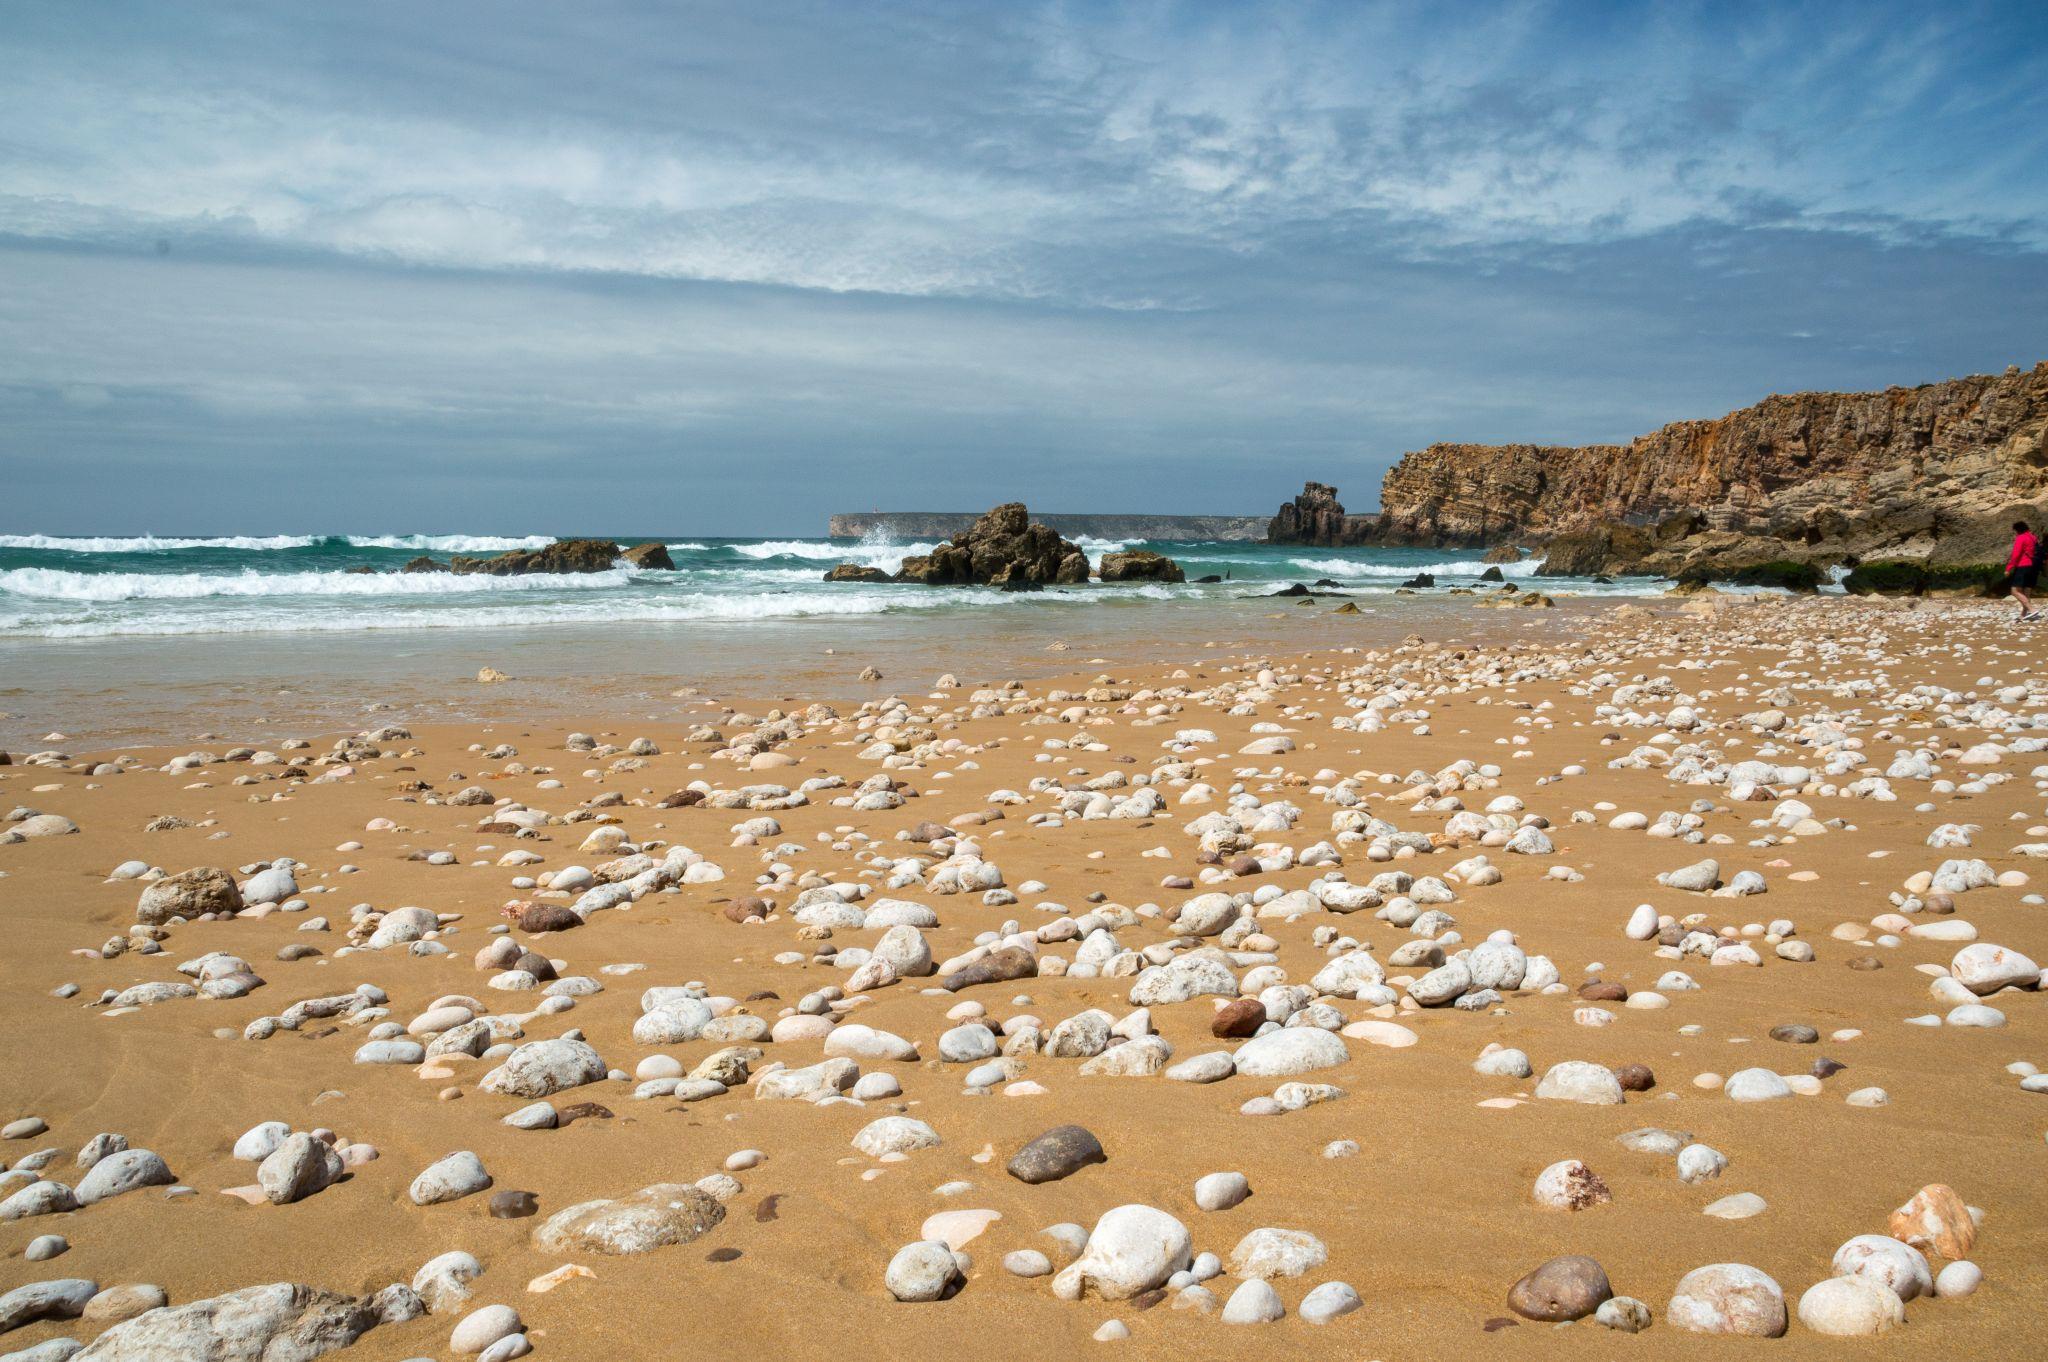 Praia do Tonel, Portugal